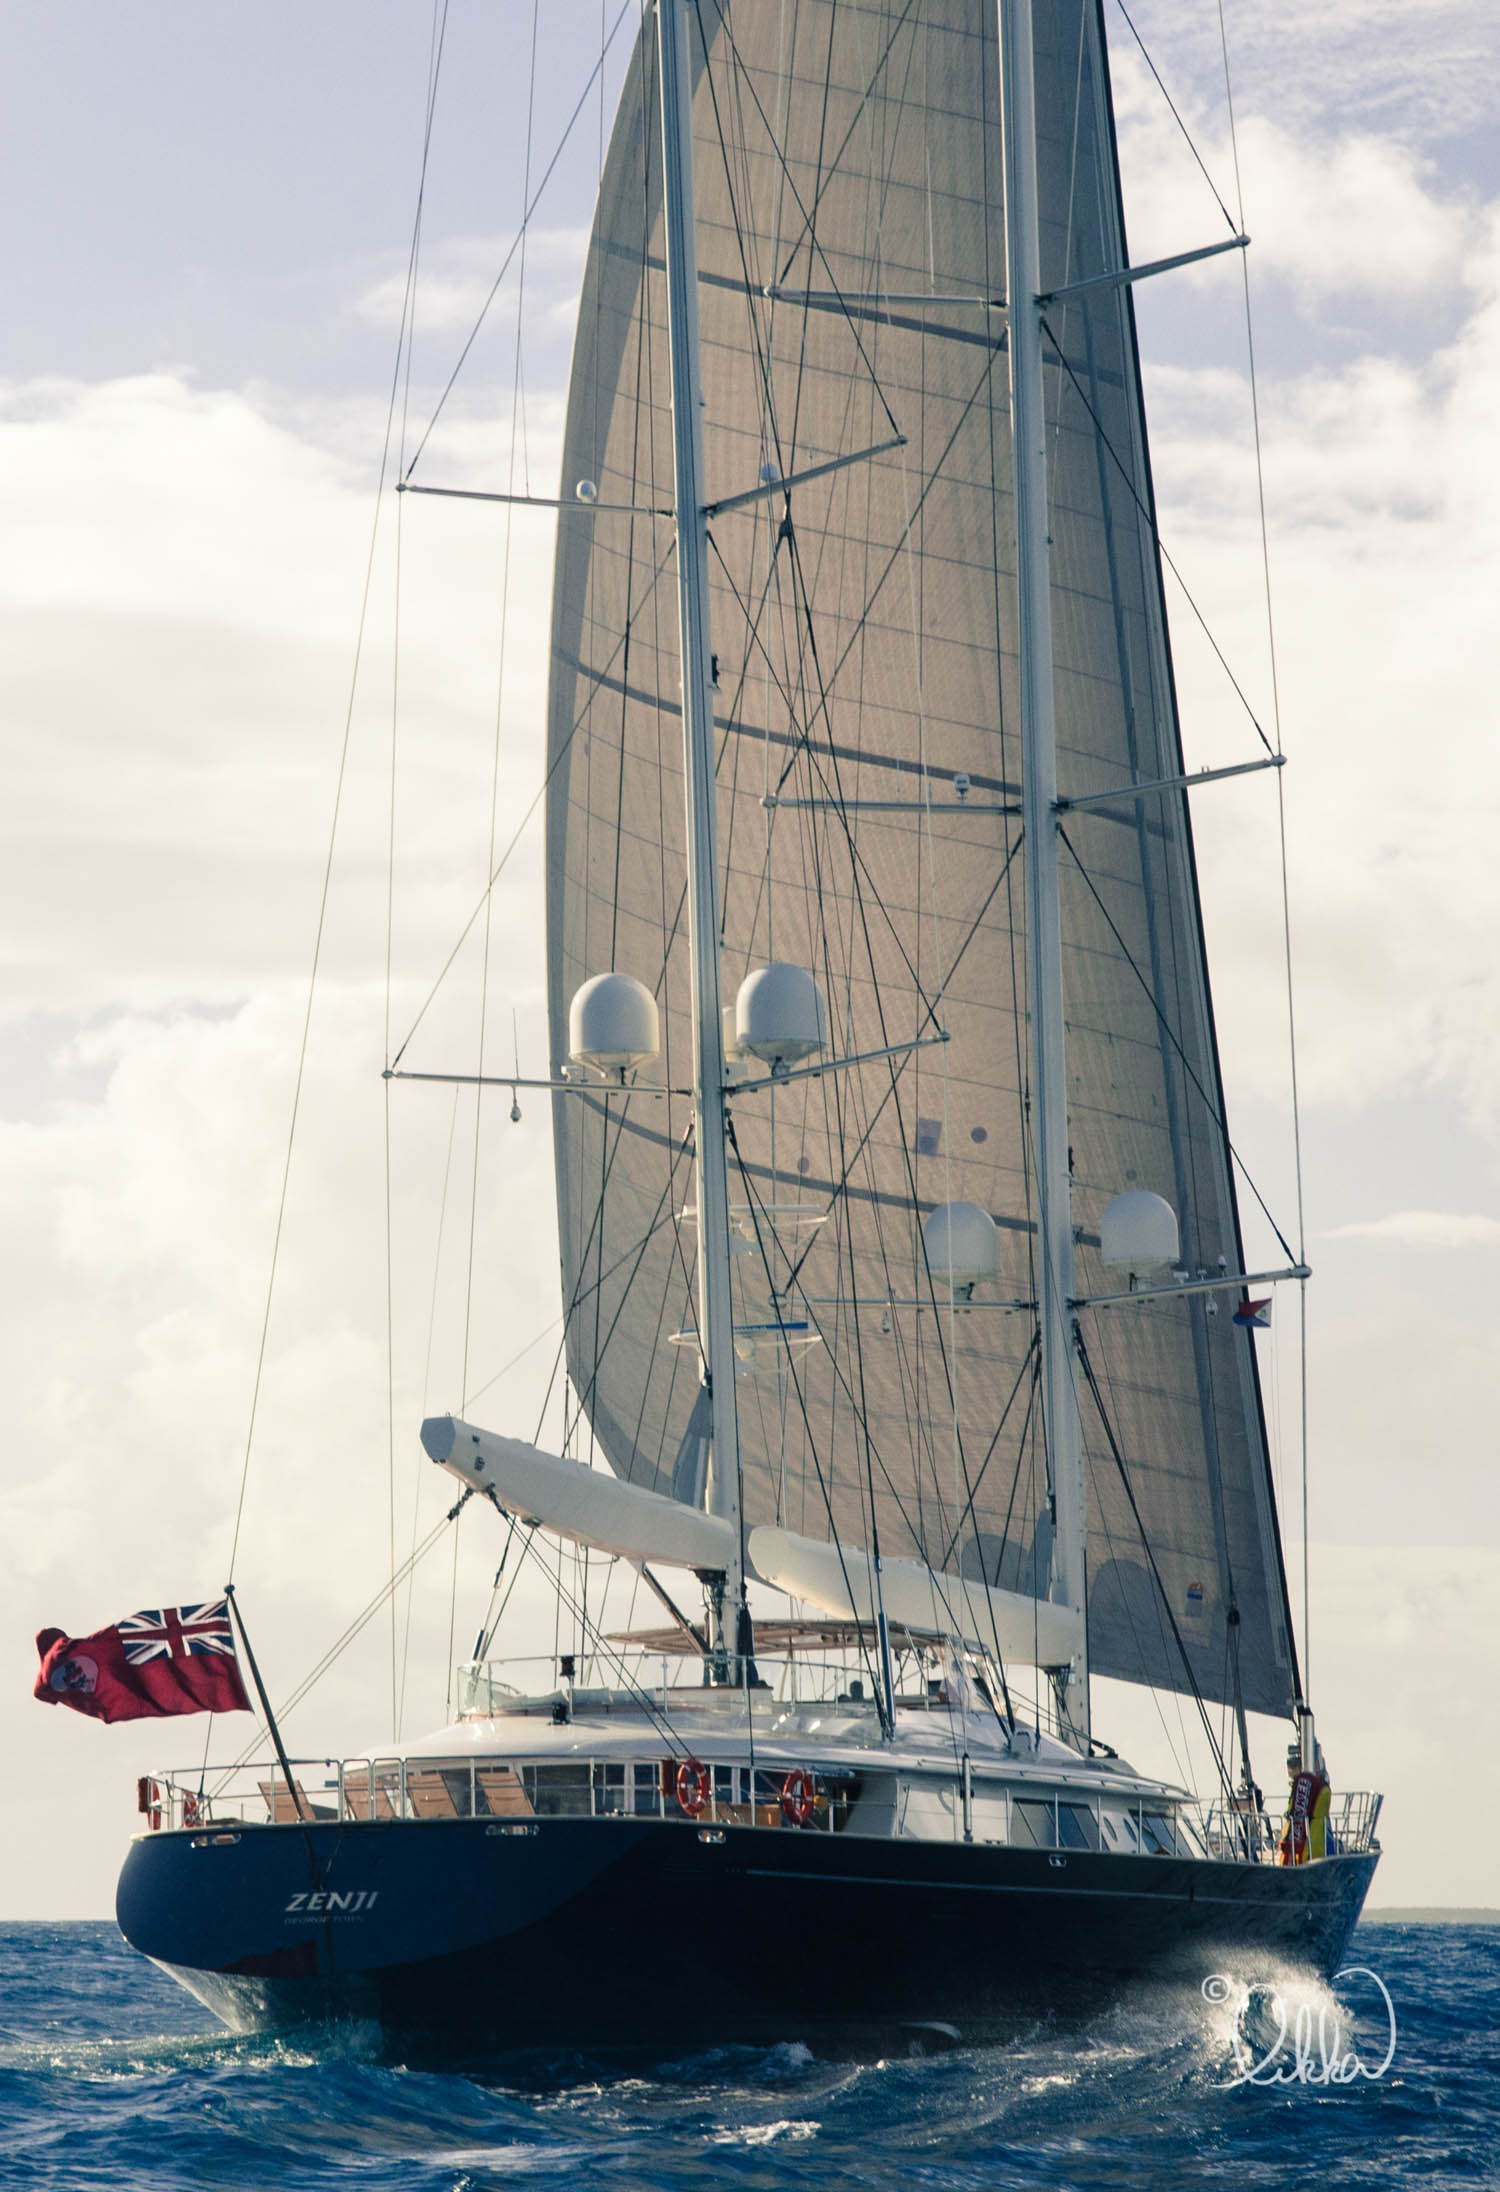 sailing-boatlife-likka-51.jpg